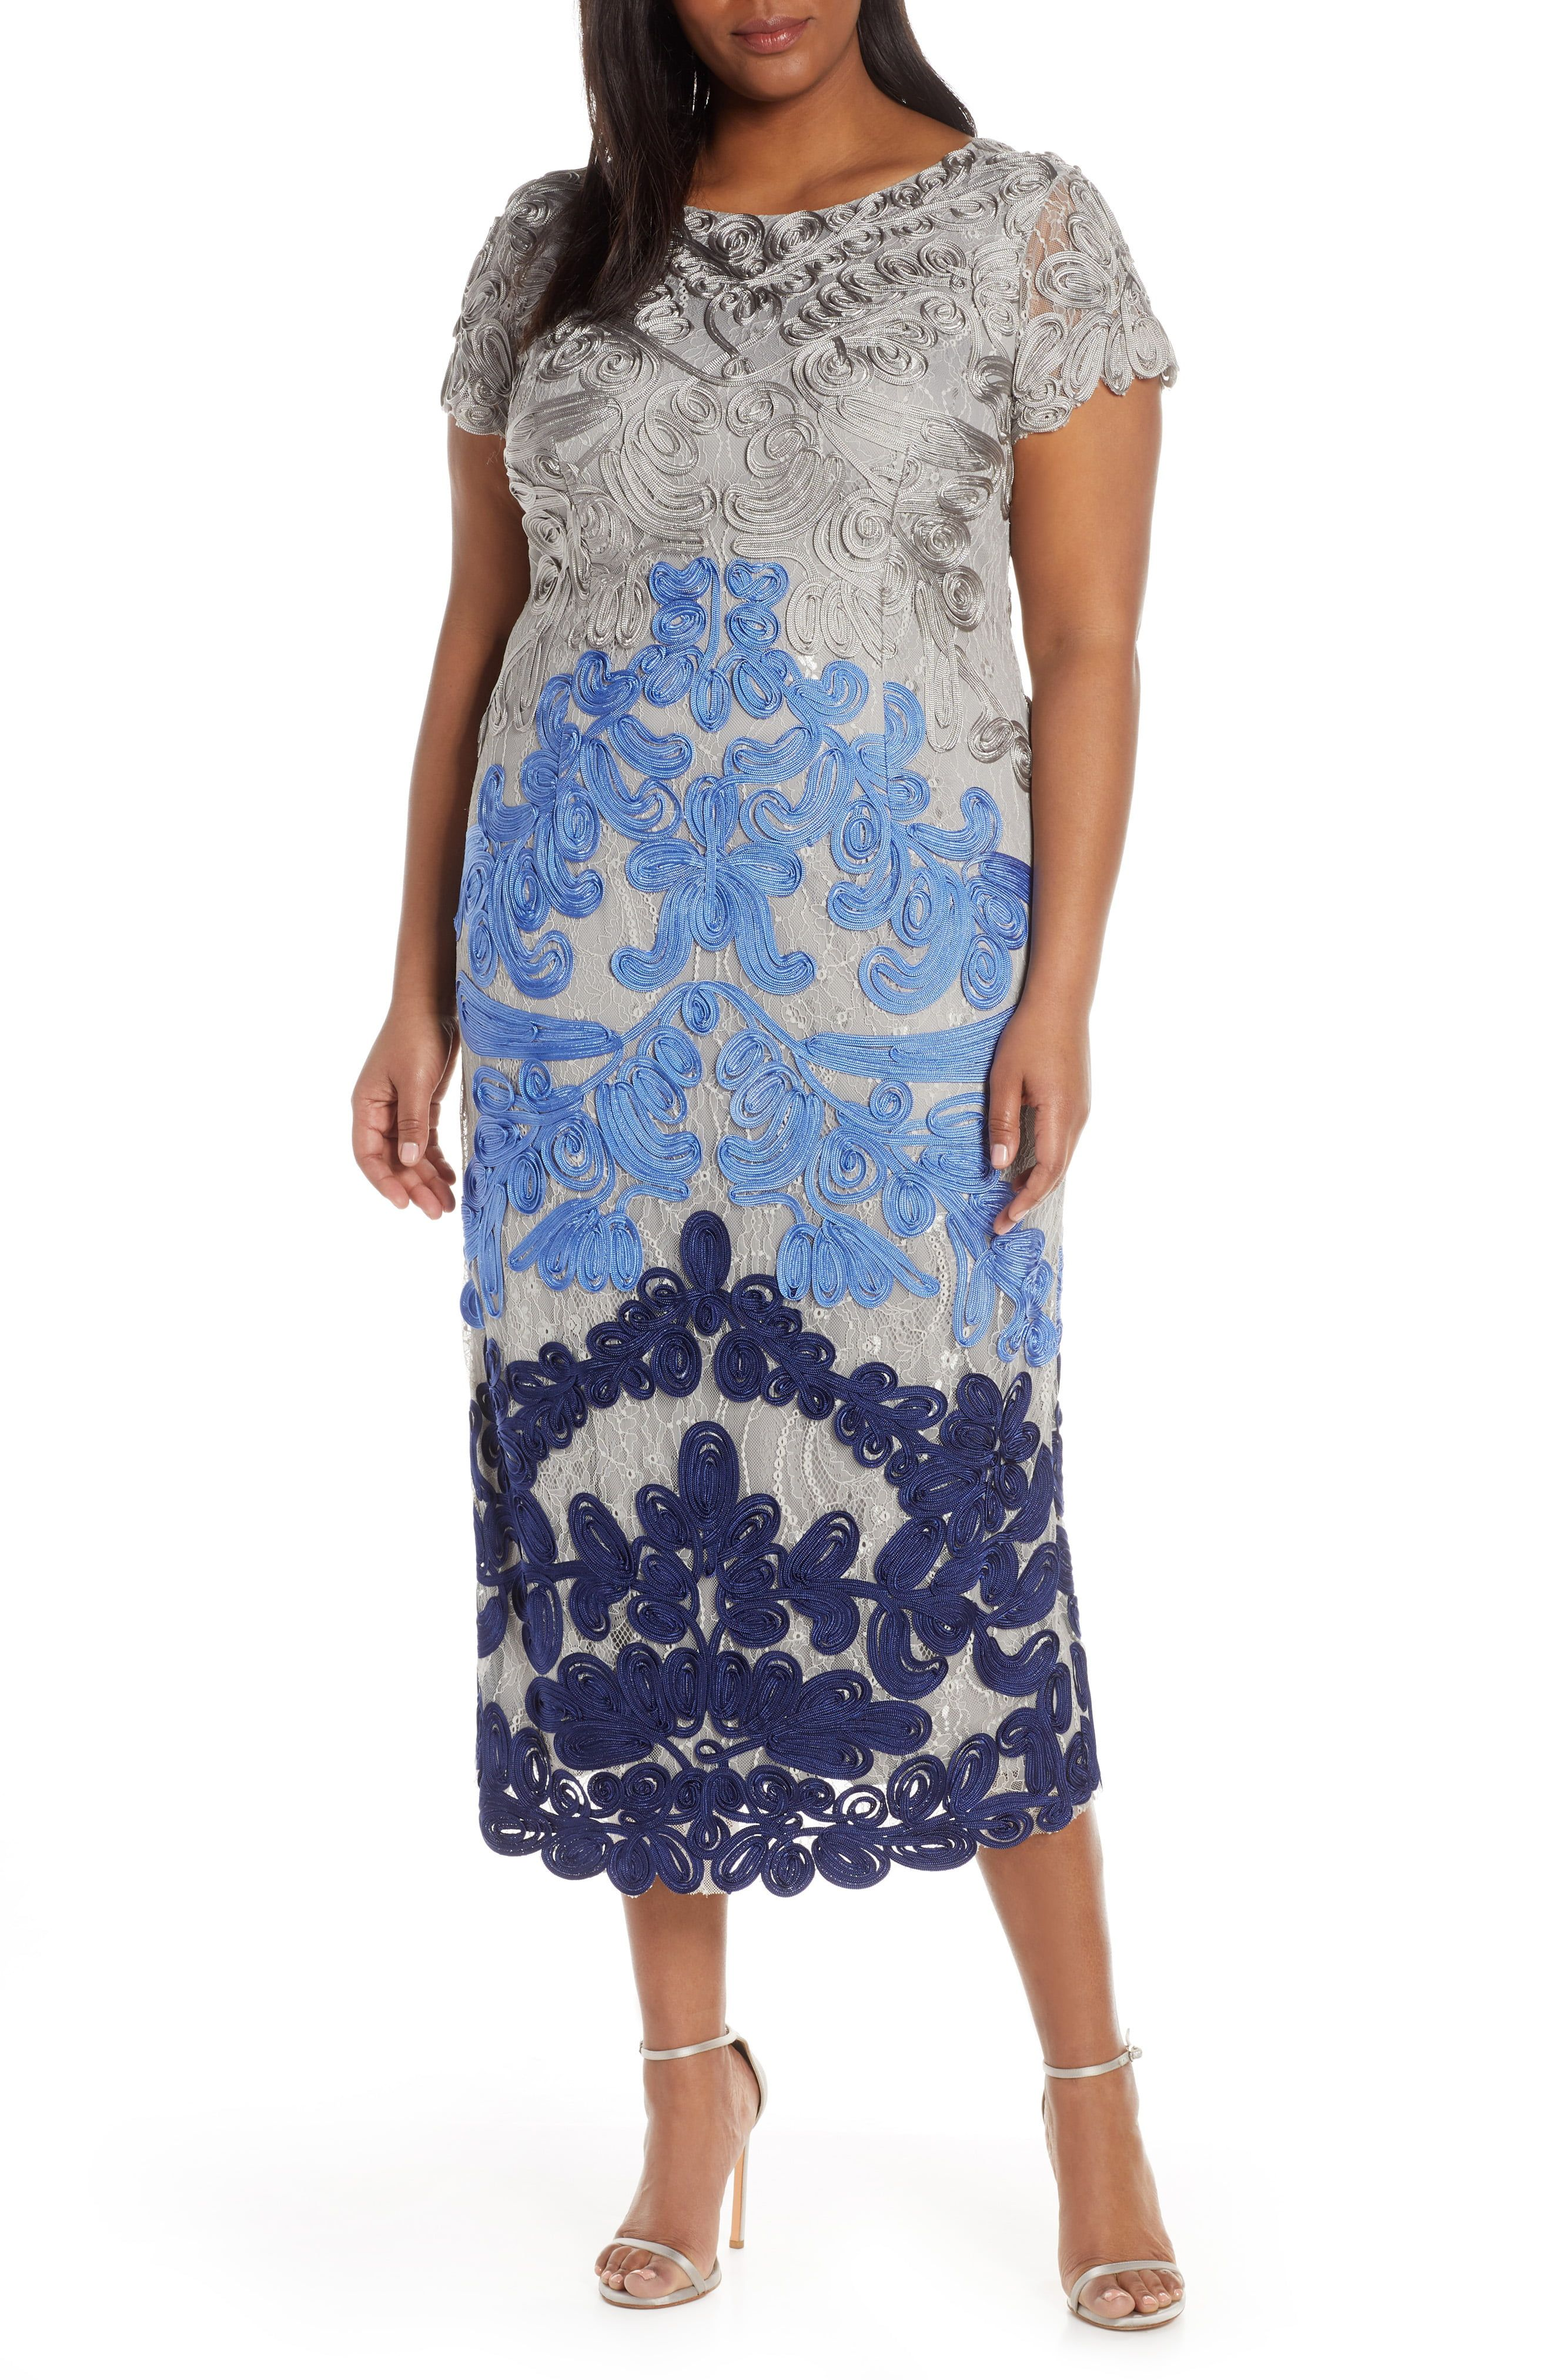 b78c5d3d1f6 Plus Size Women s Js Collections Two Tone Soutache Embroidered Midi Dress